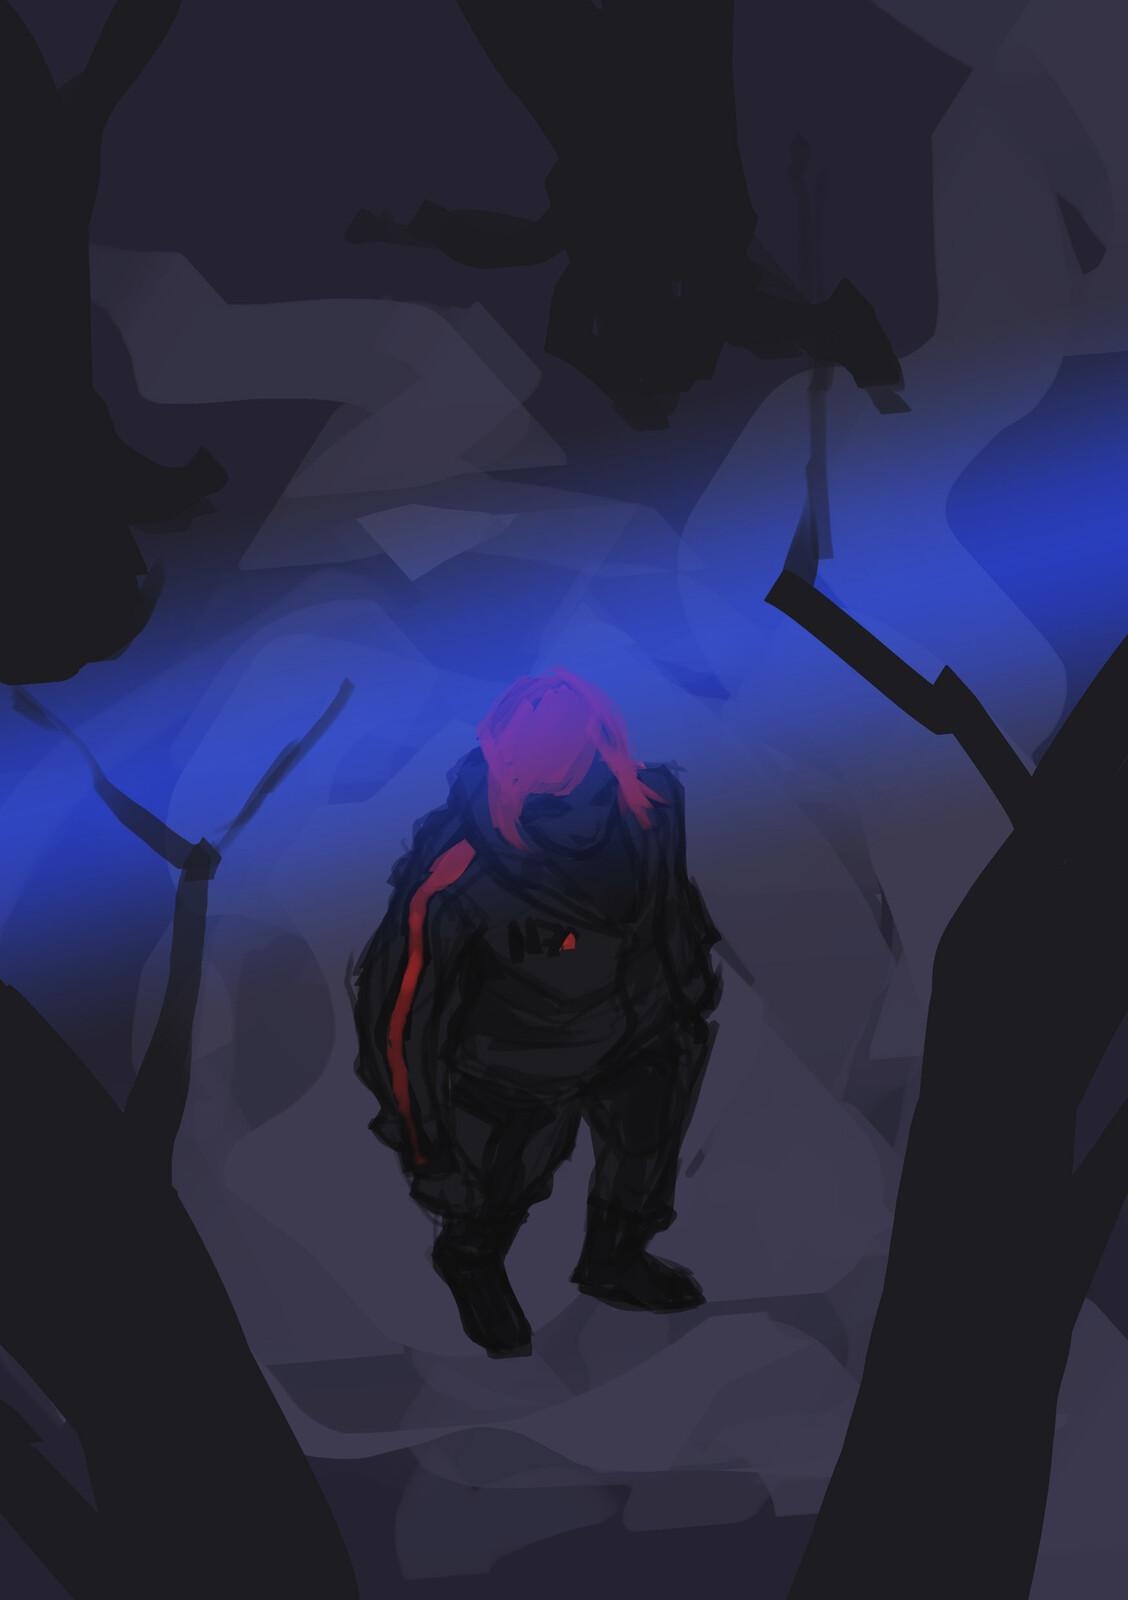 Shepard's dream wip